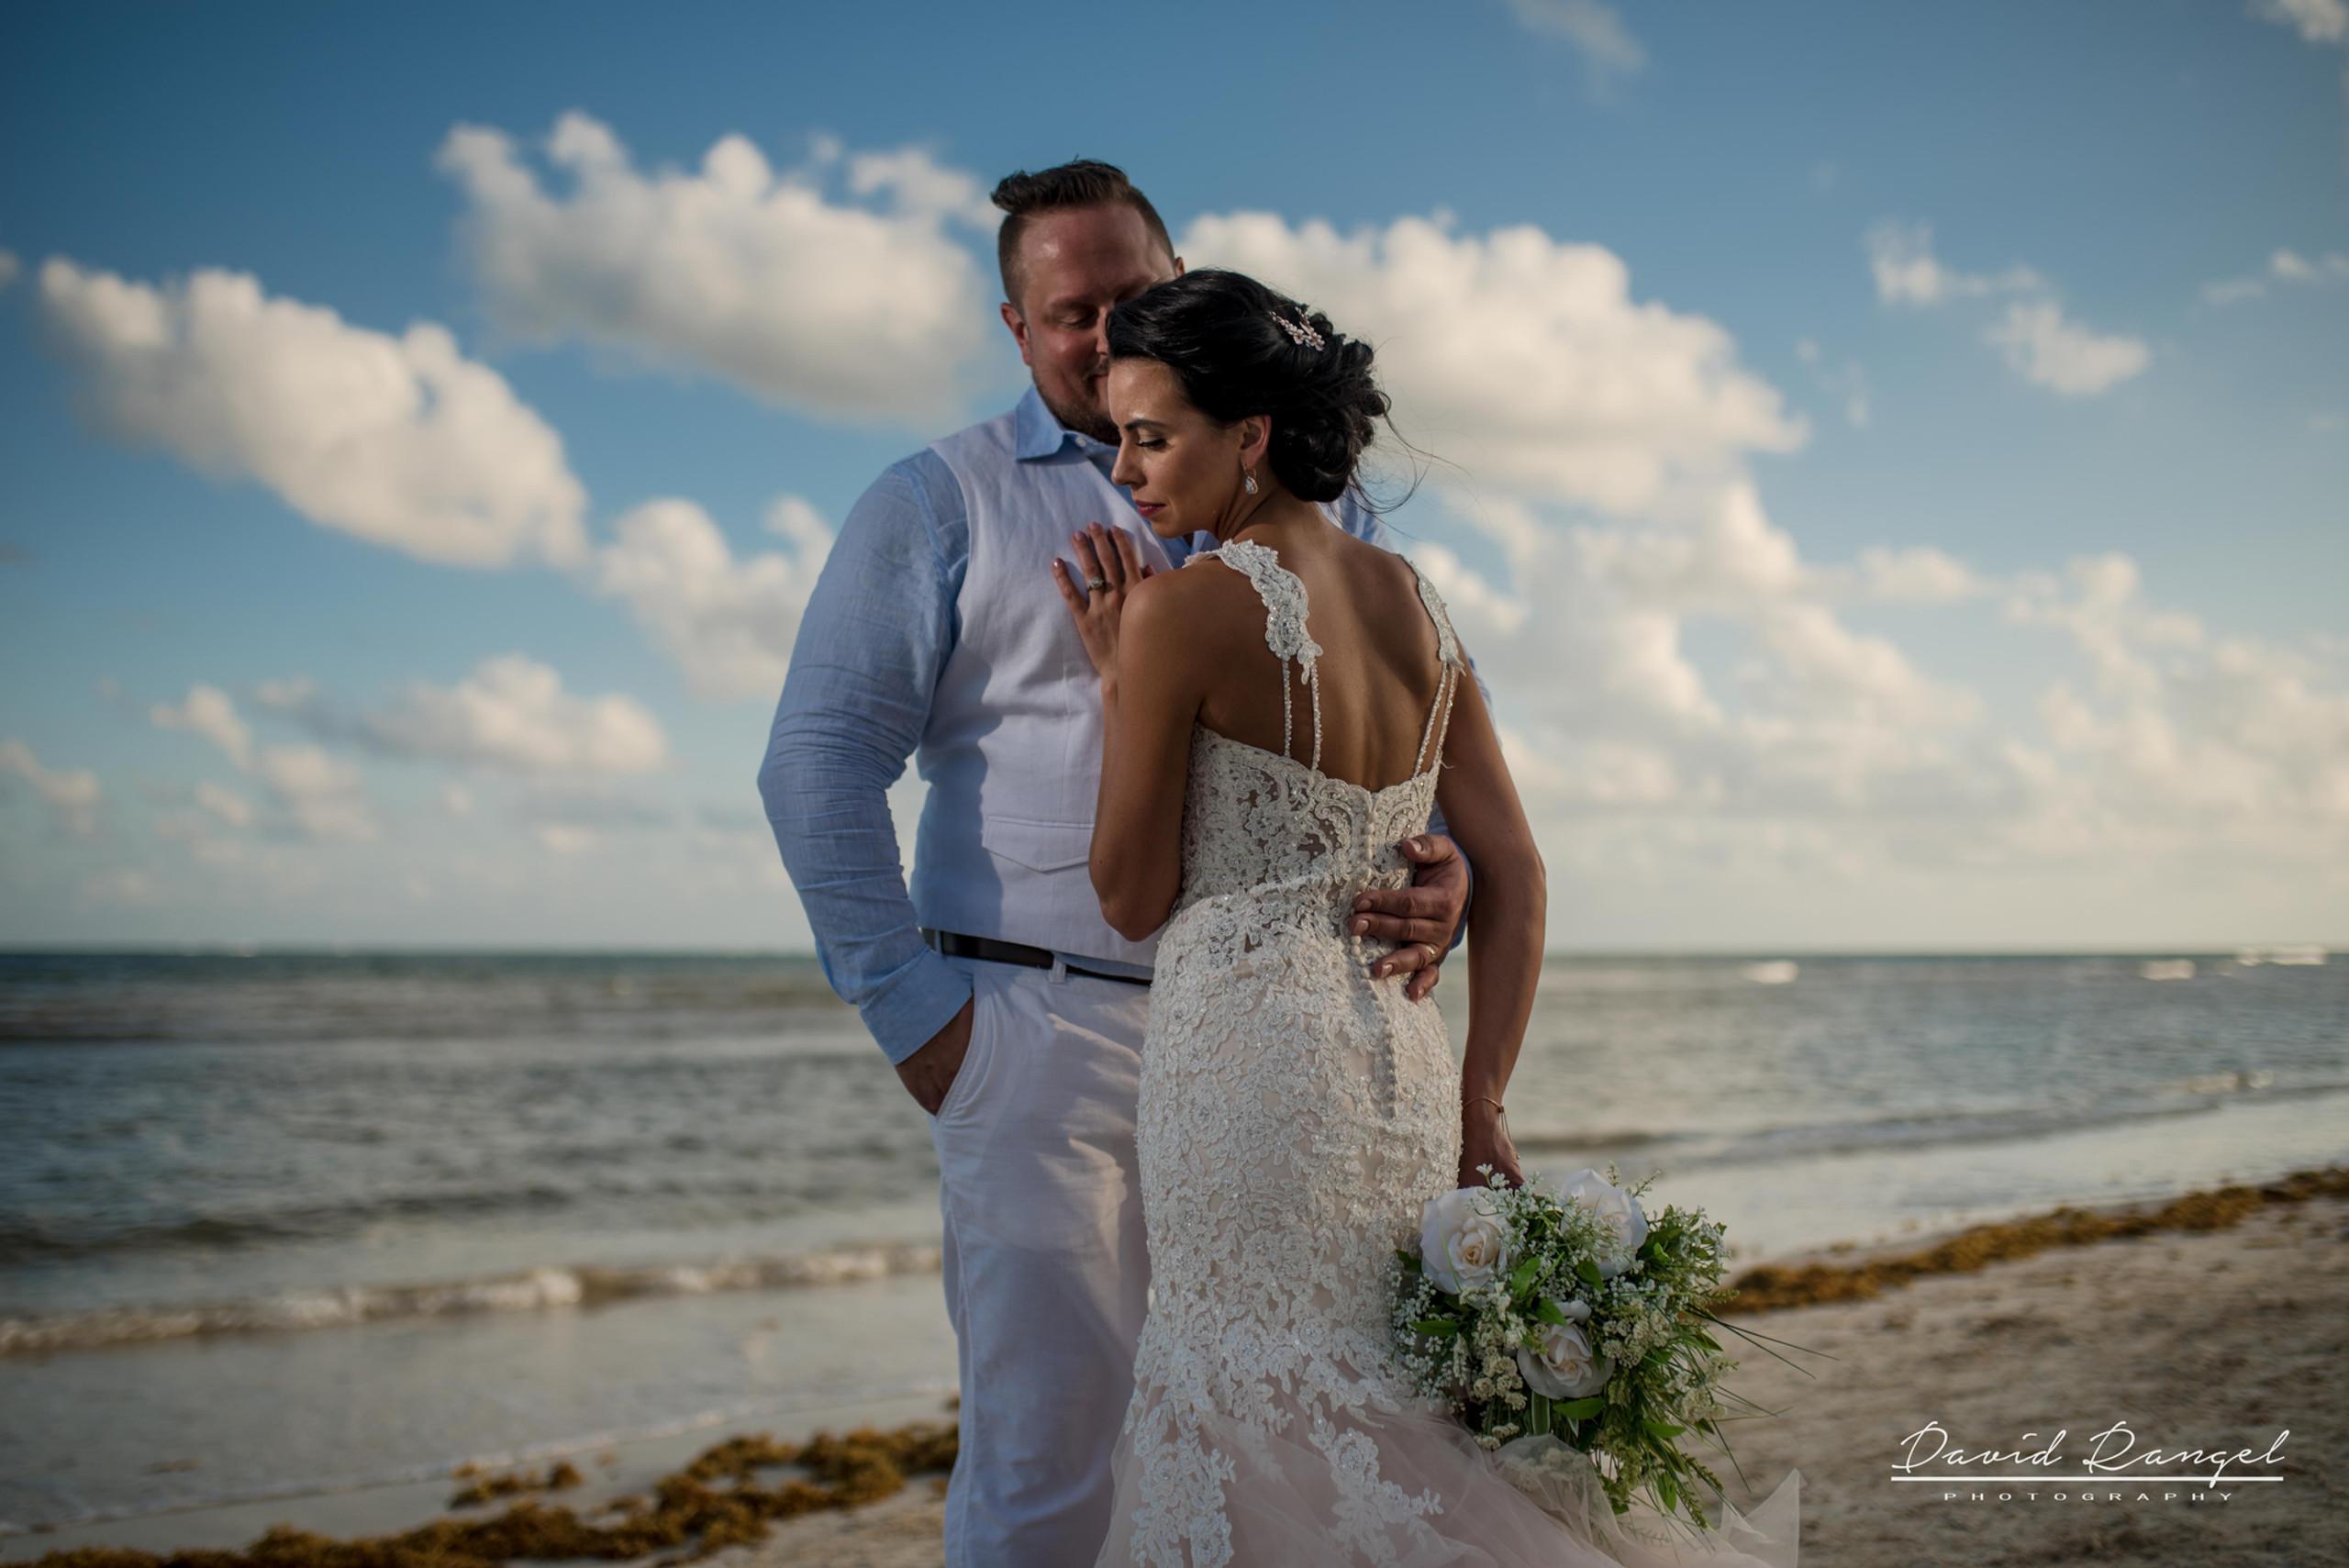 wedding+photo+bride+groom+bouquet+session+sunset